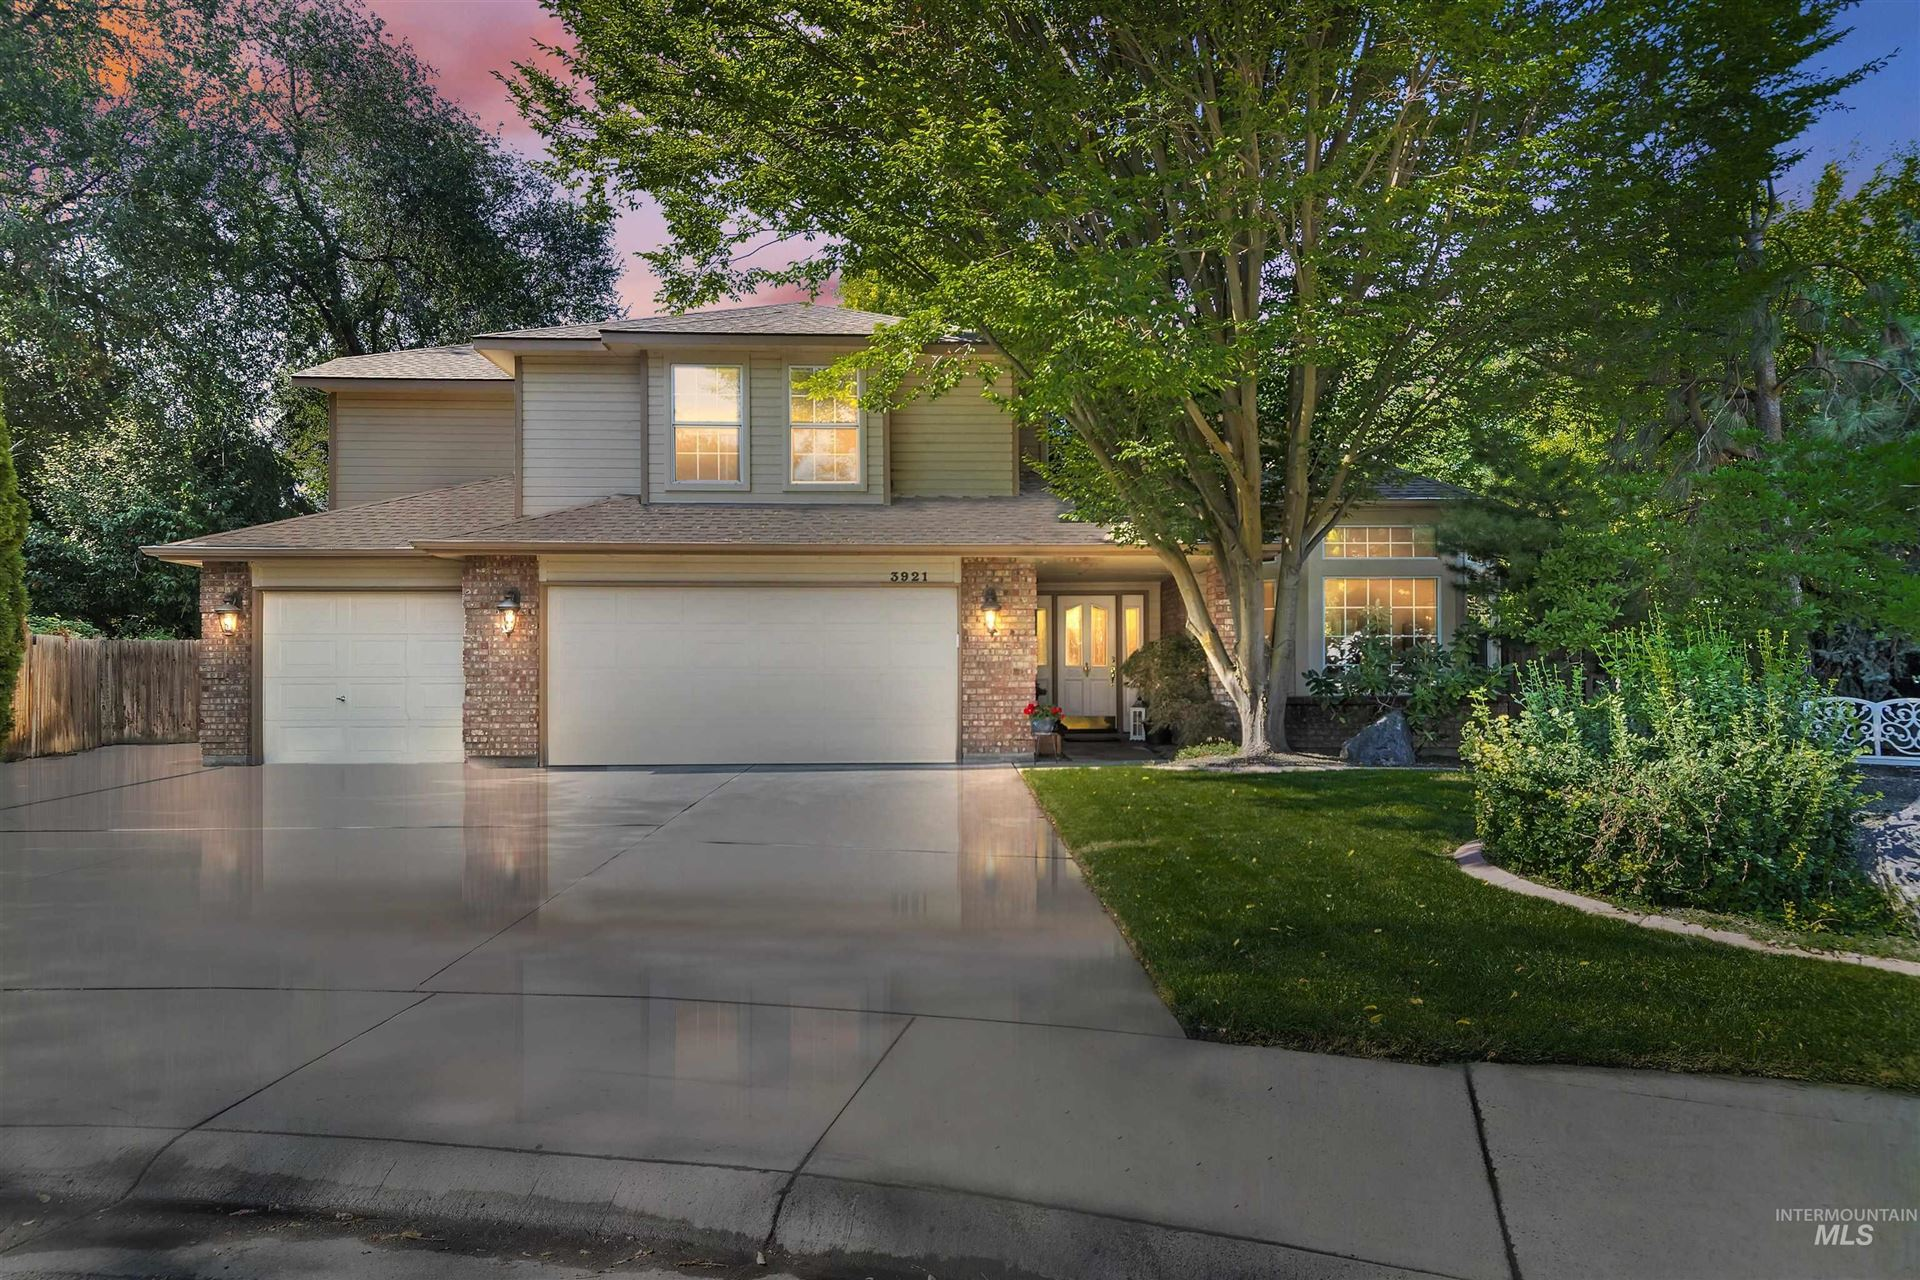 3921 N Samson Pl, Boise, ID 83704 - MLS#: 98821143